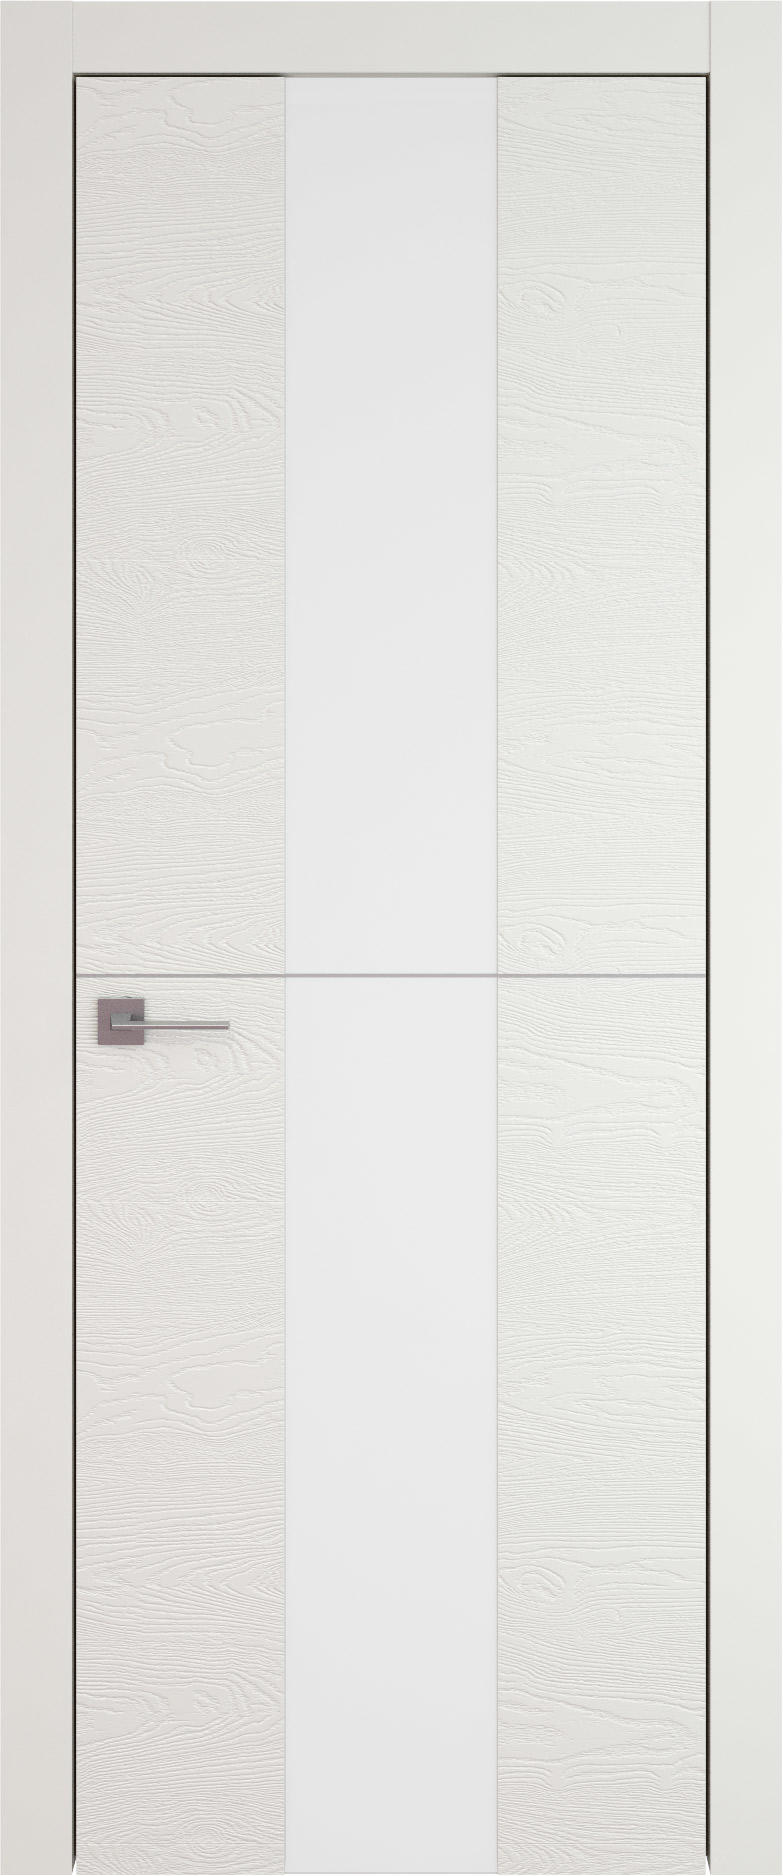 Tivoli Ж-3 цвет - Бежевая эмаль по шпону (RAL 9010) Со стеклом (ДО)